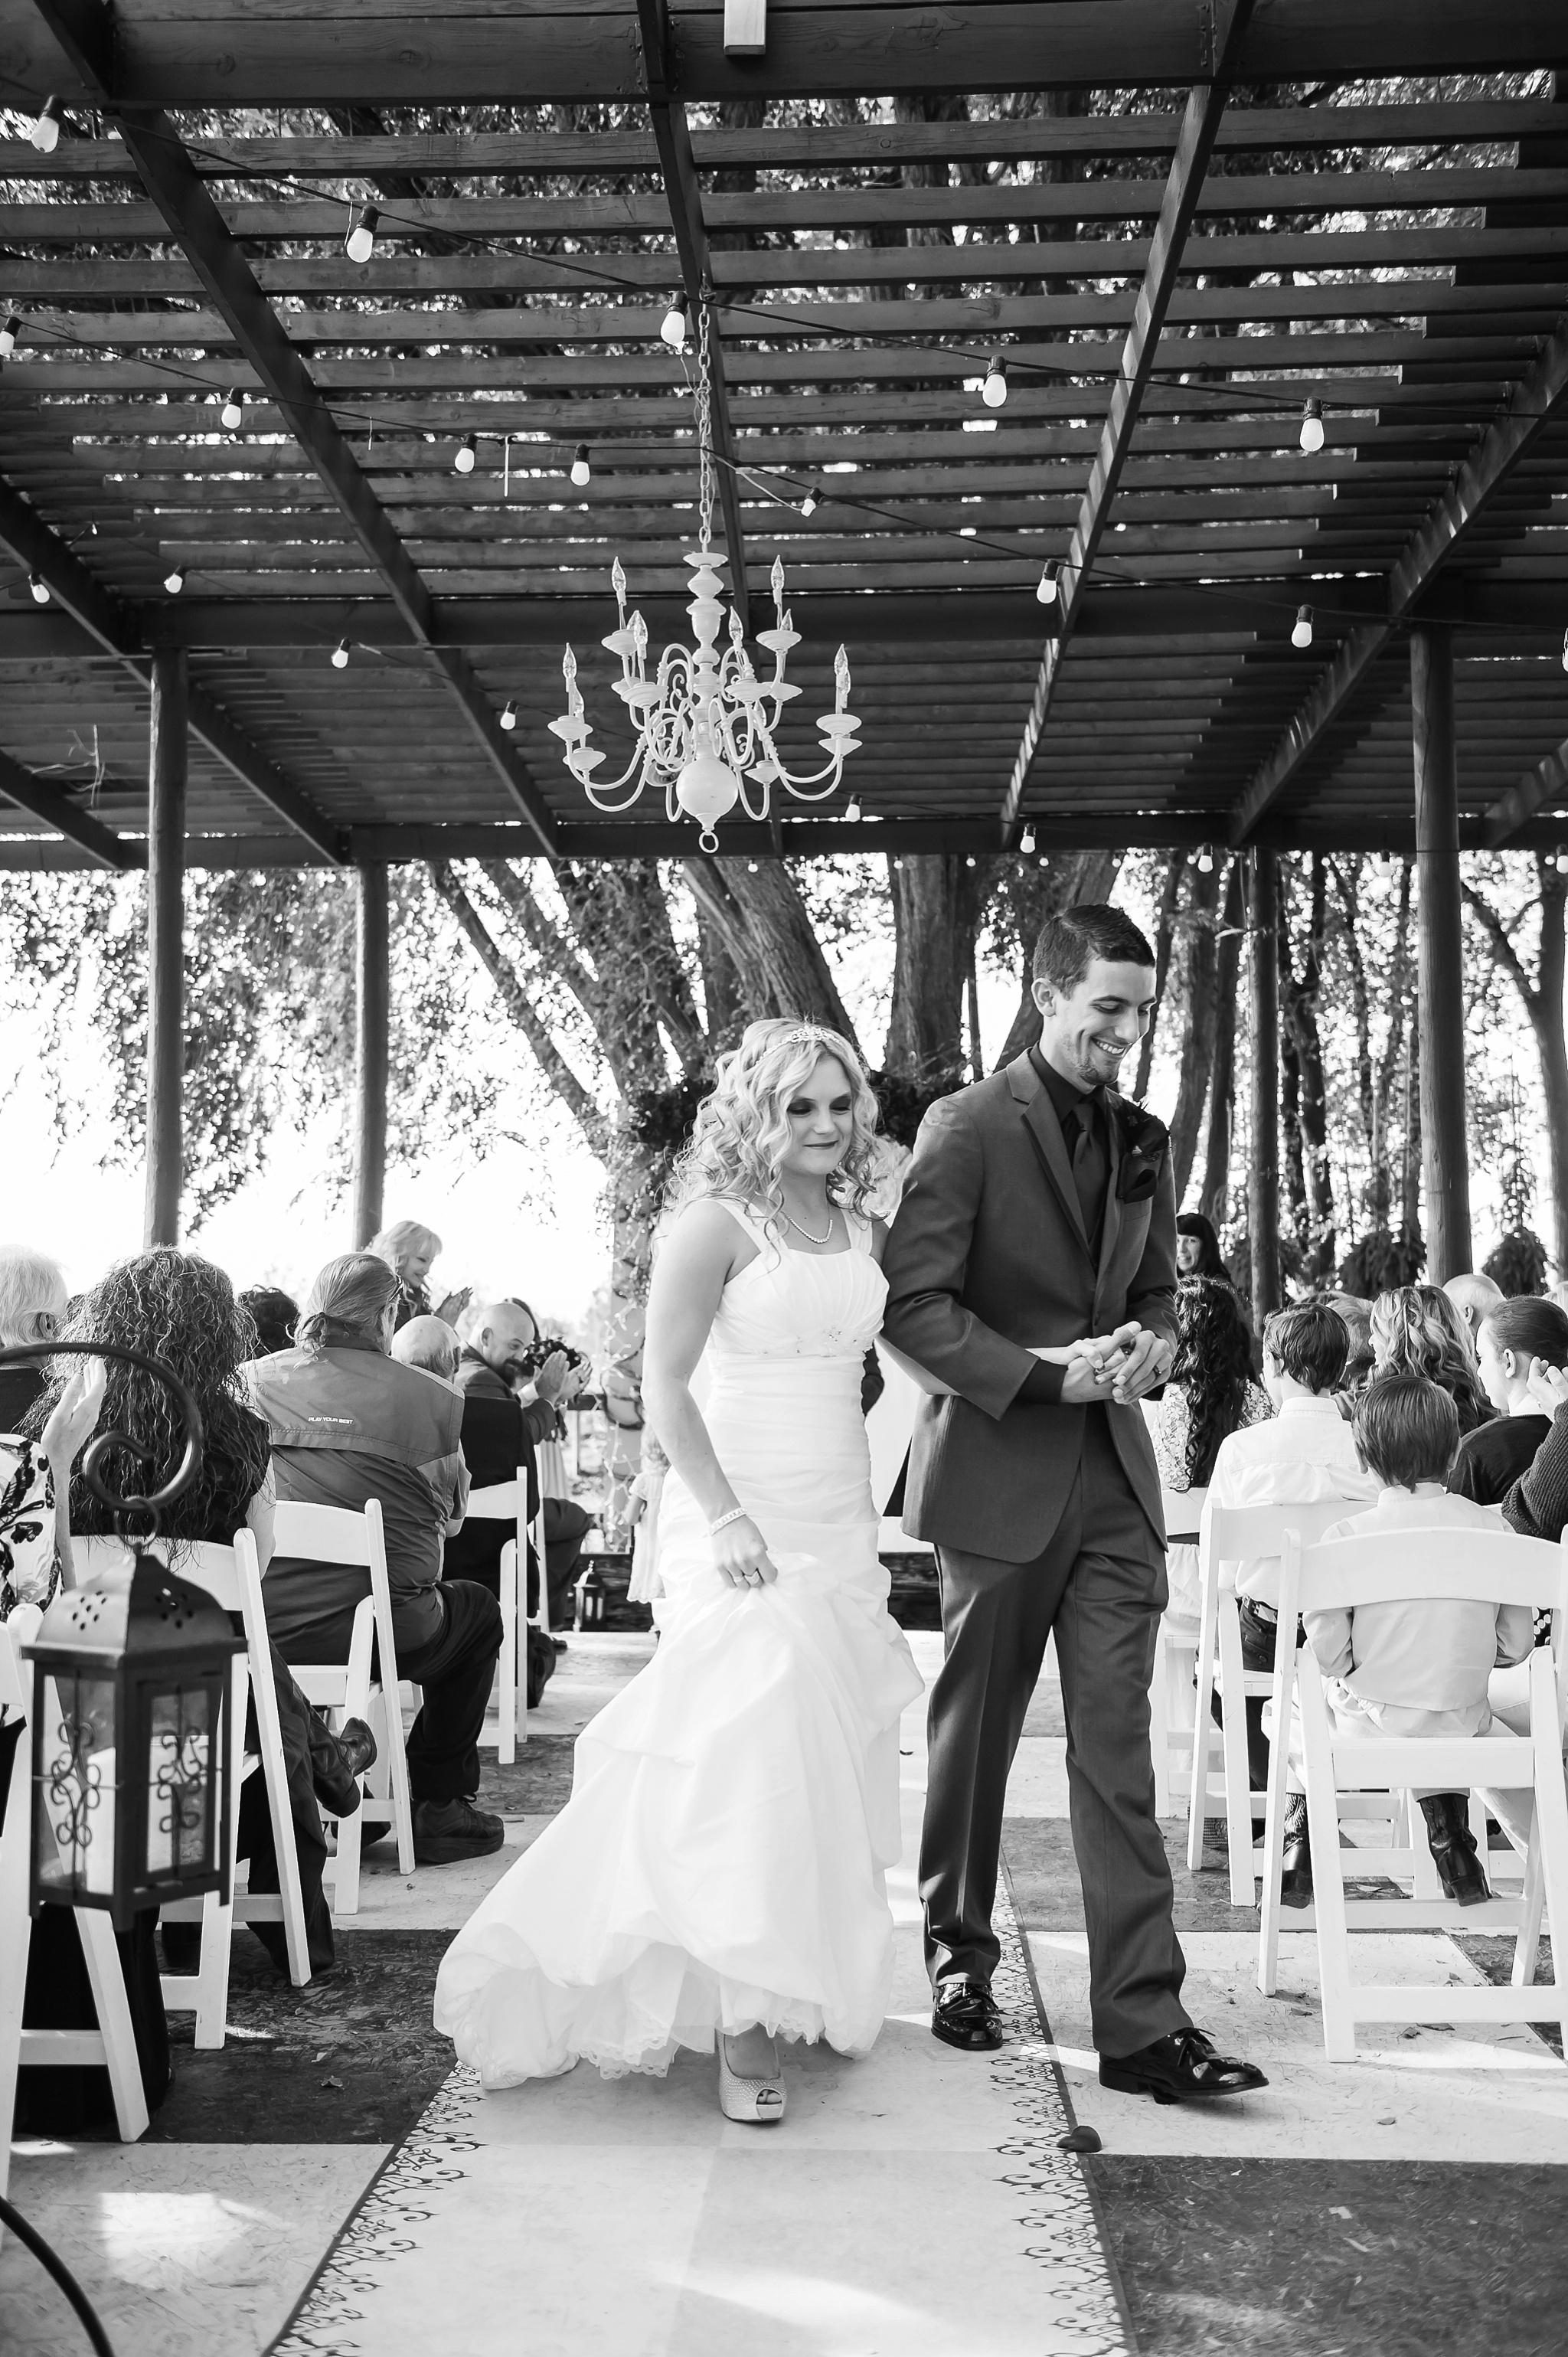 SLC Utah Wedding Photographer Ali Sumsion 038